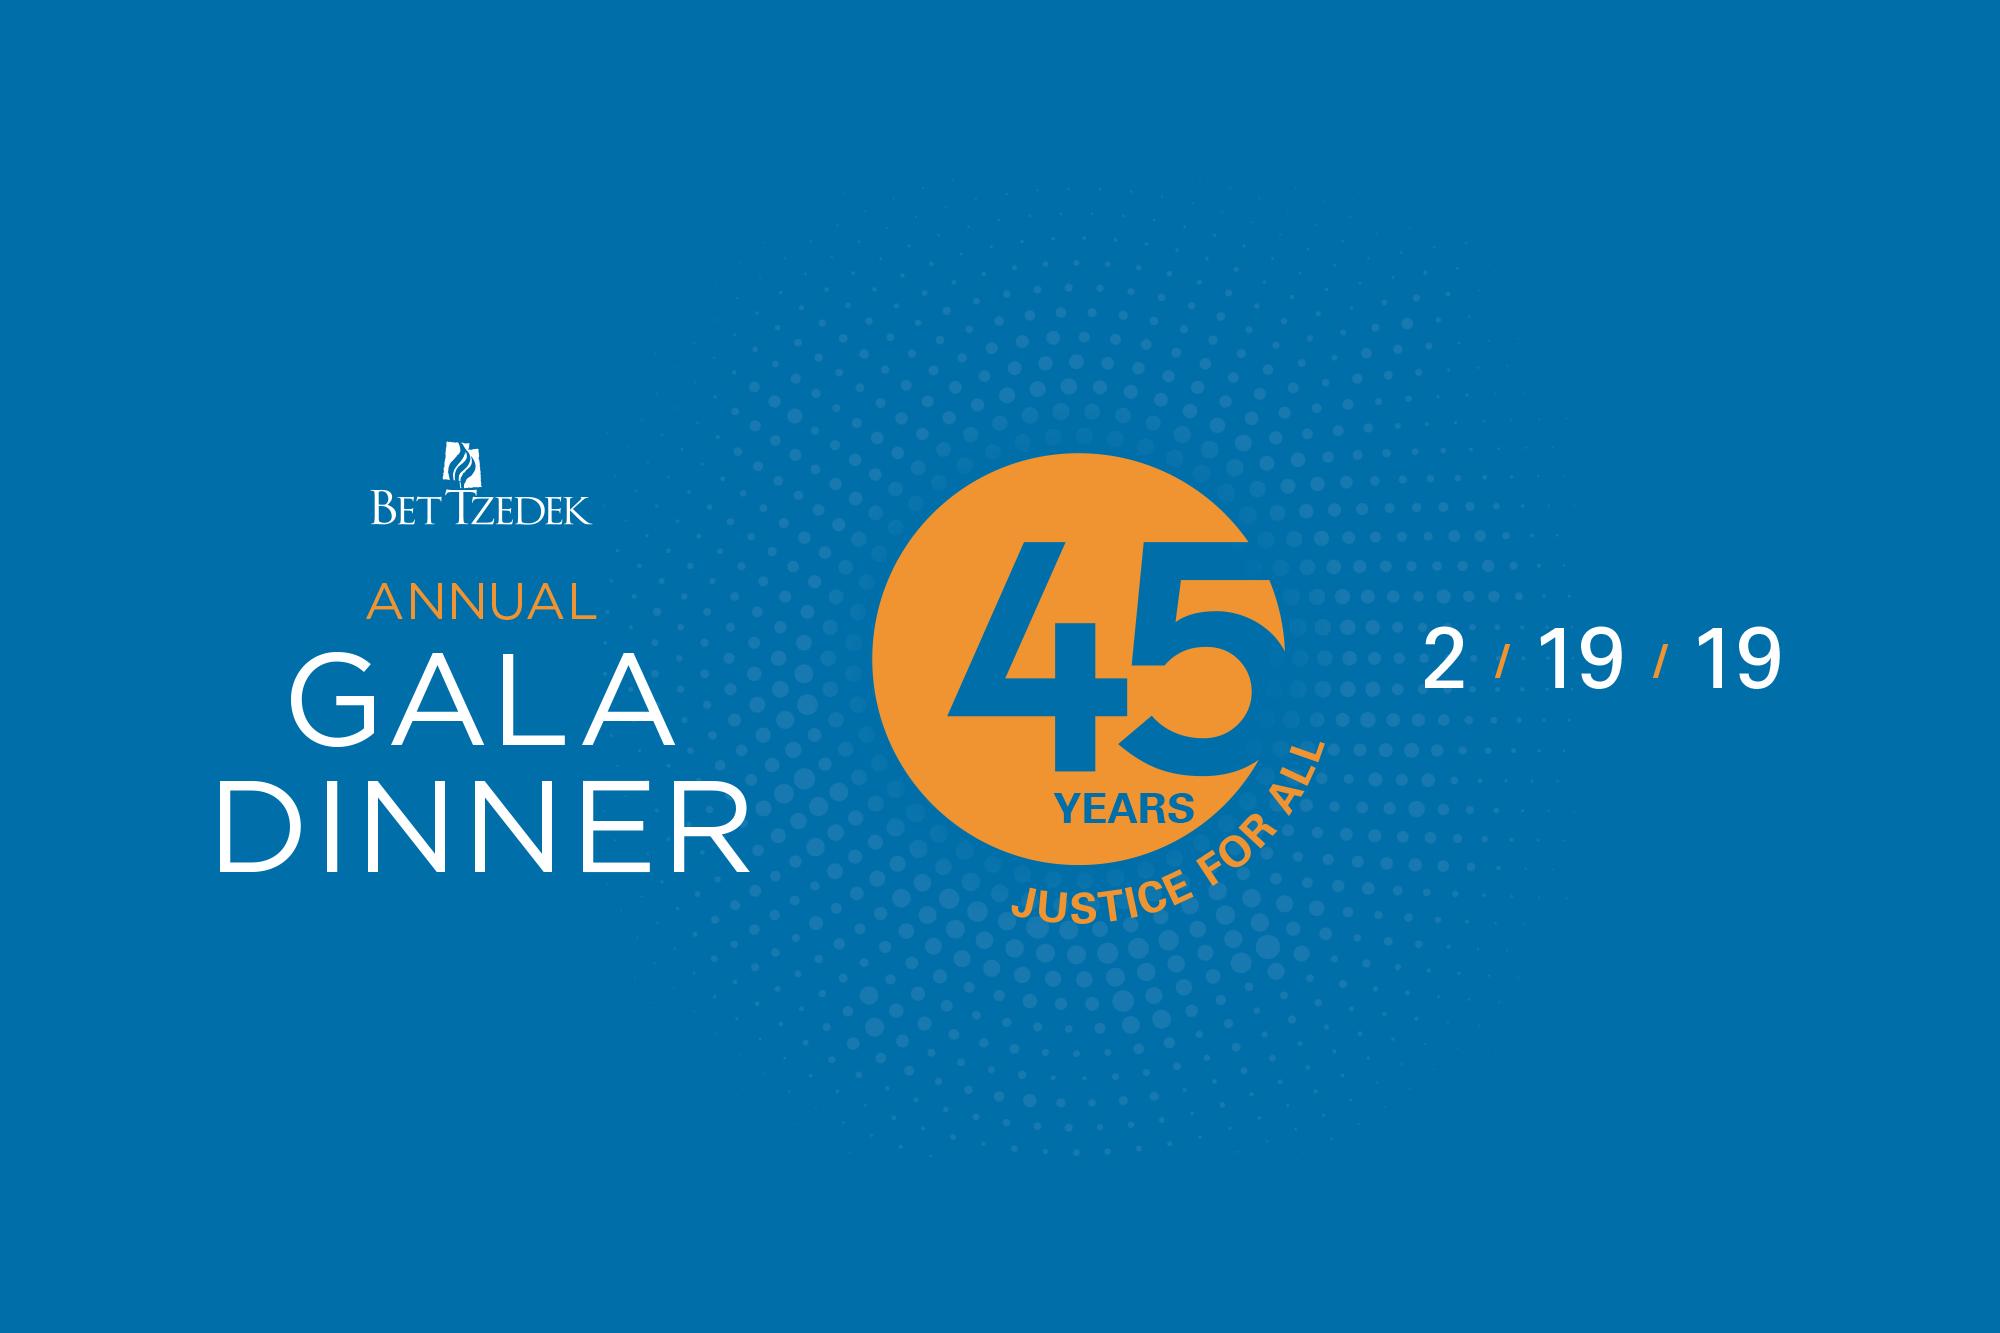 The Annual Gala